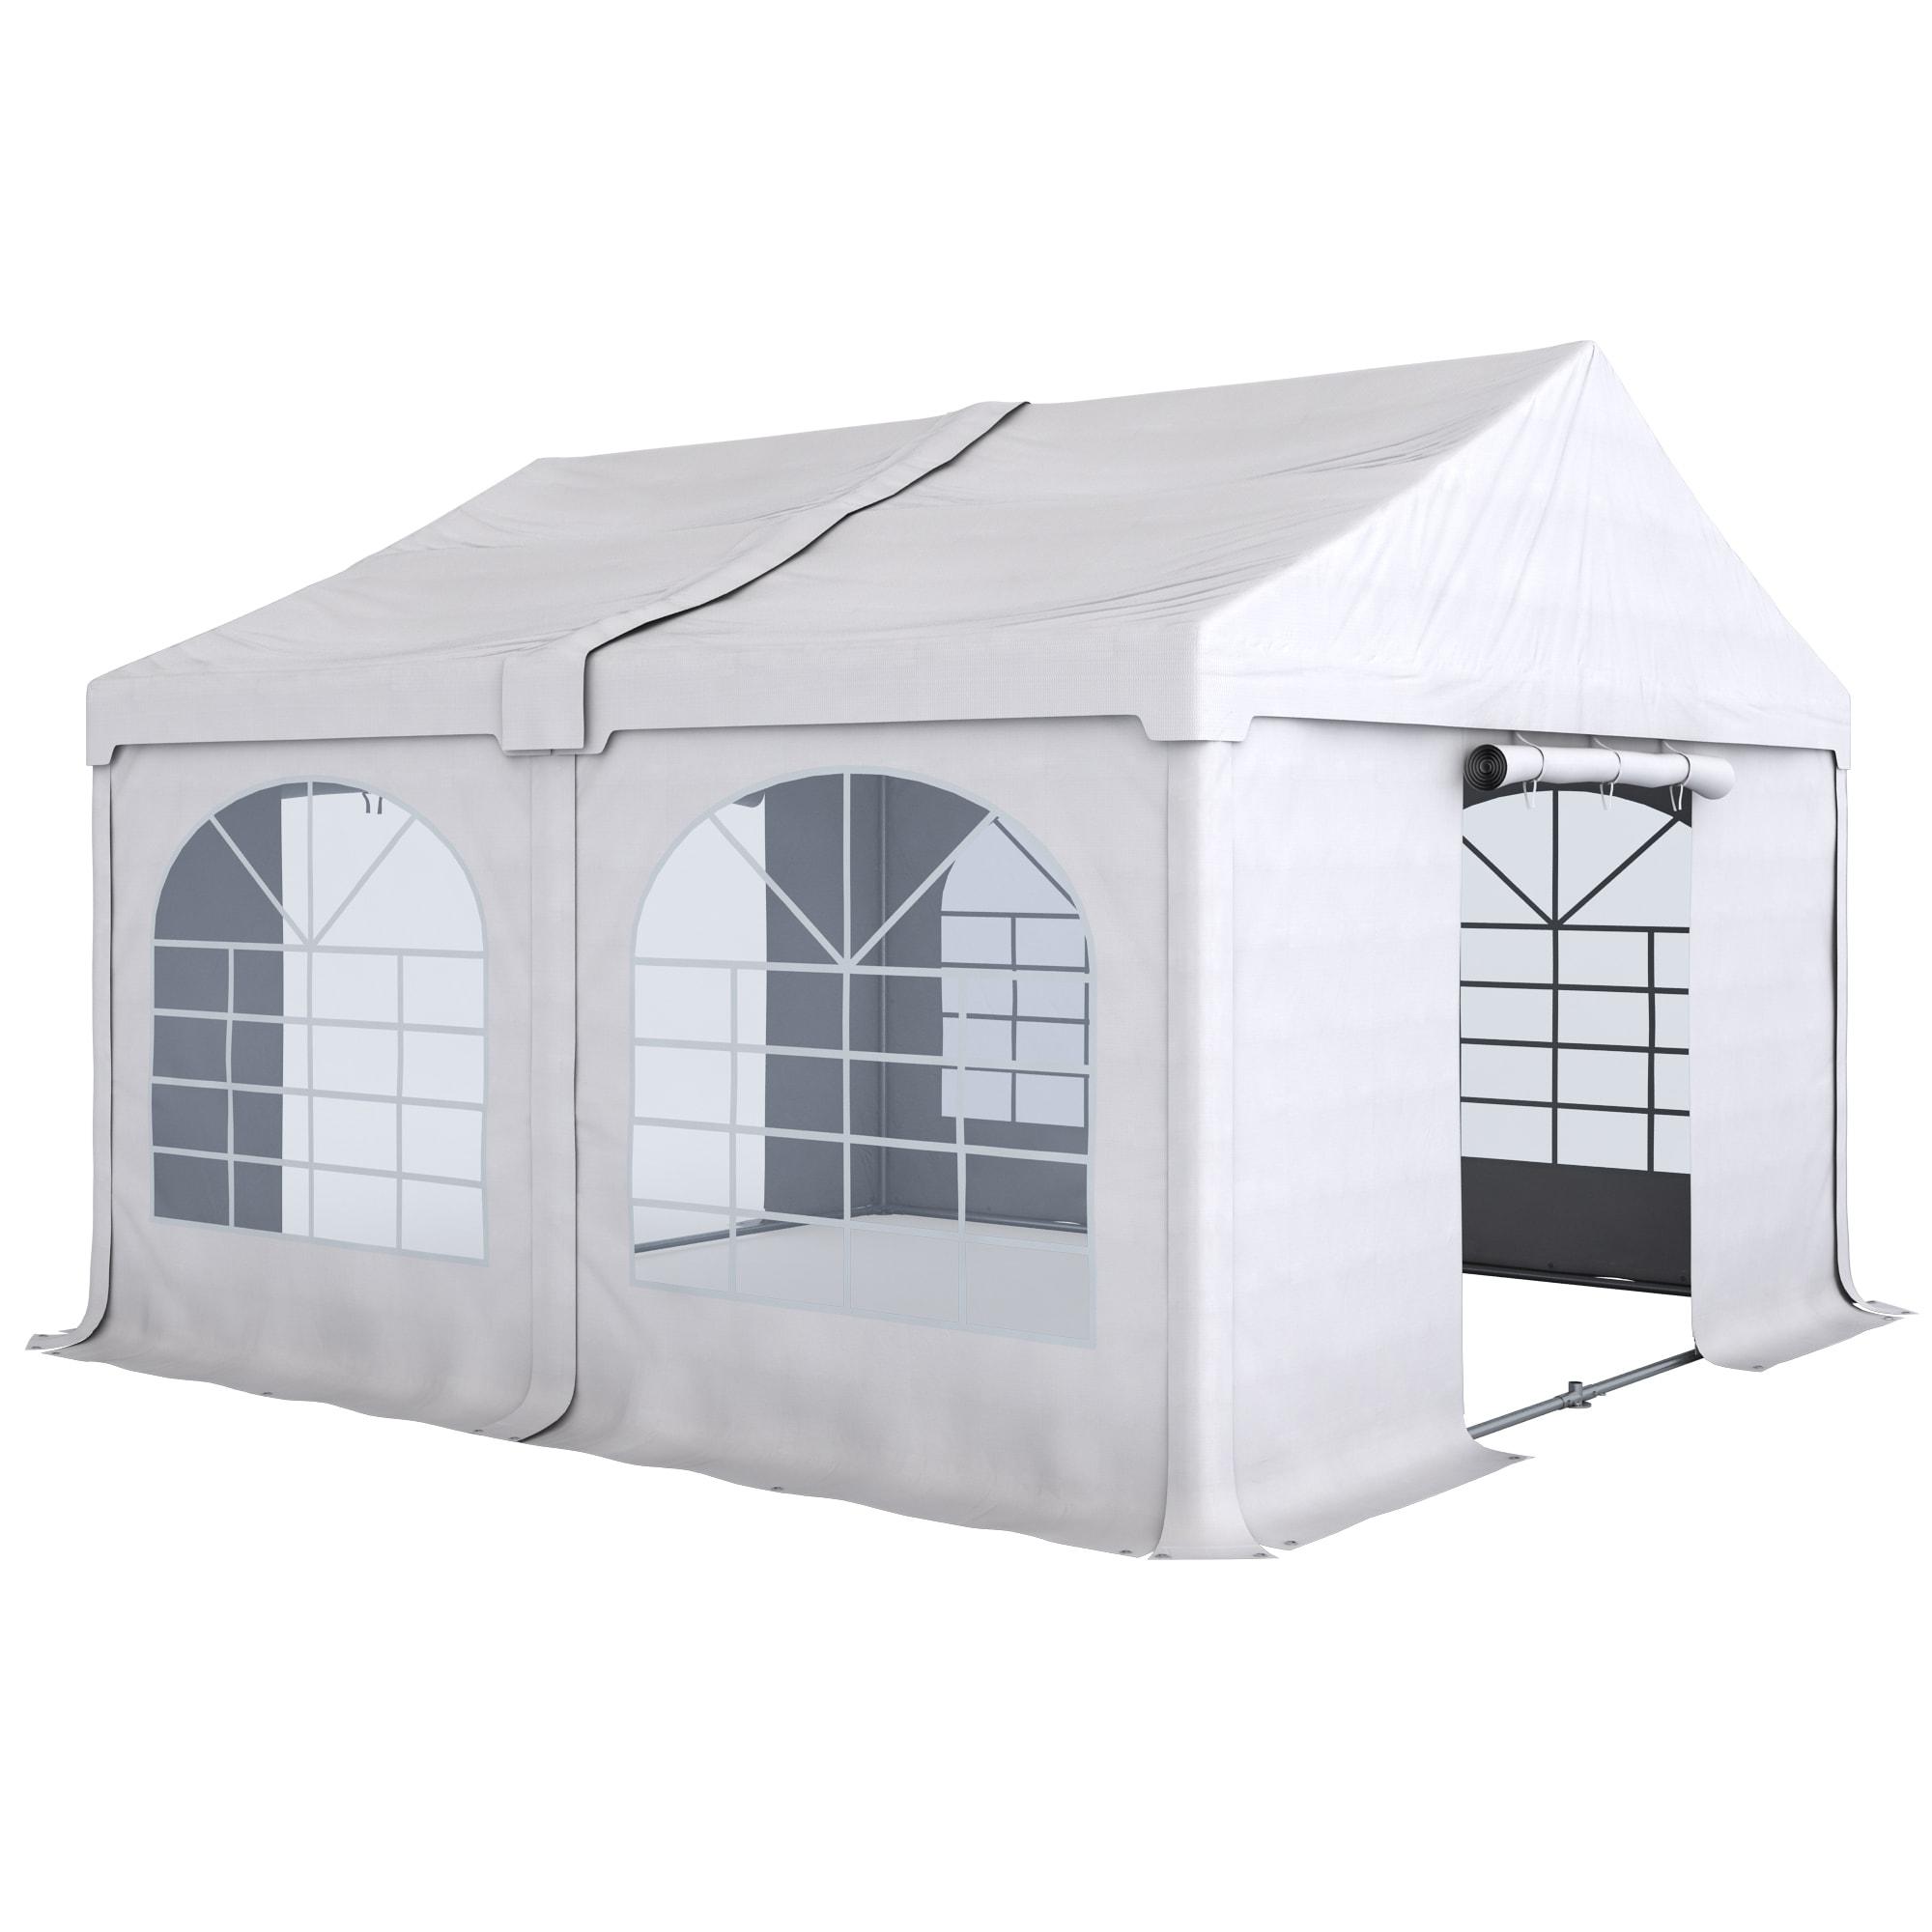 partyzelt festzelt bierzelt wasserdicht gartenzelt pavillon zelt gartenpavillon ebay. Black Bedroom Furniture Sets. Home Design Ideas